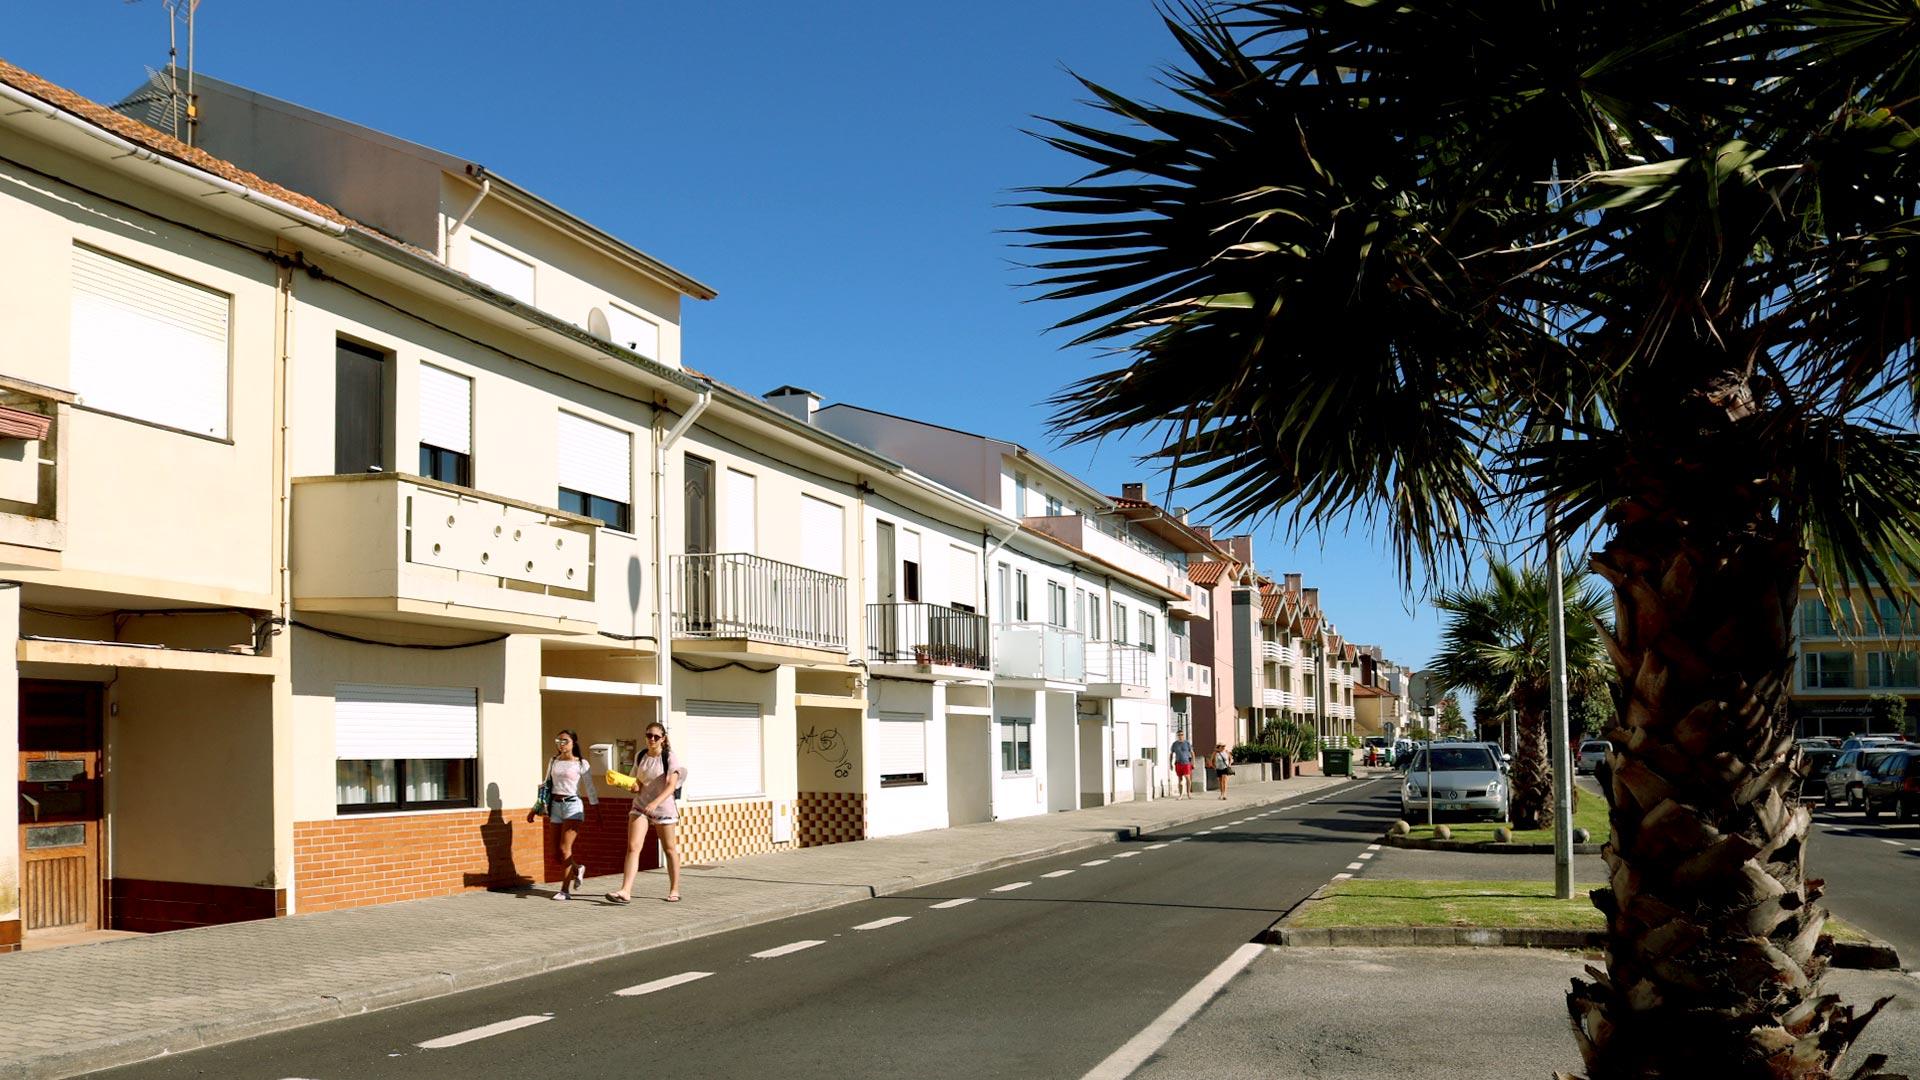 ilhavo-gafanha-da-nazare-praia-da-barra-Aveiro-ville-real-estate-imobiliaria-comprar-arrendar-vender-moradia-apartamento-casa-t0-t1-t2-t3-t4-3